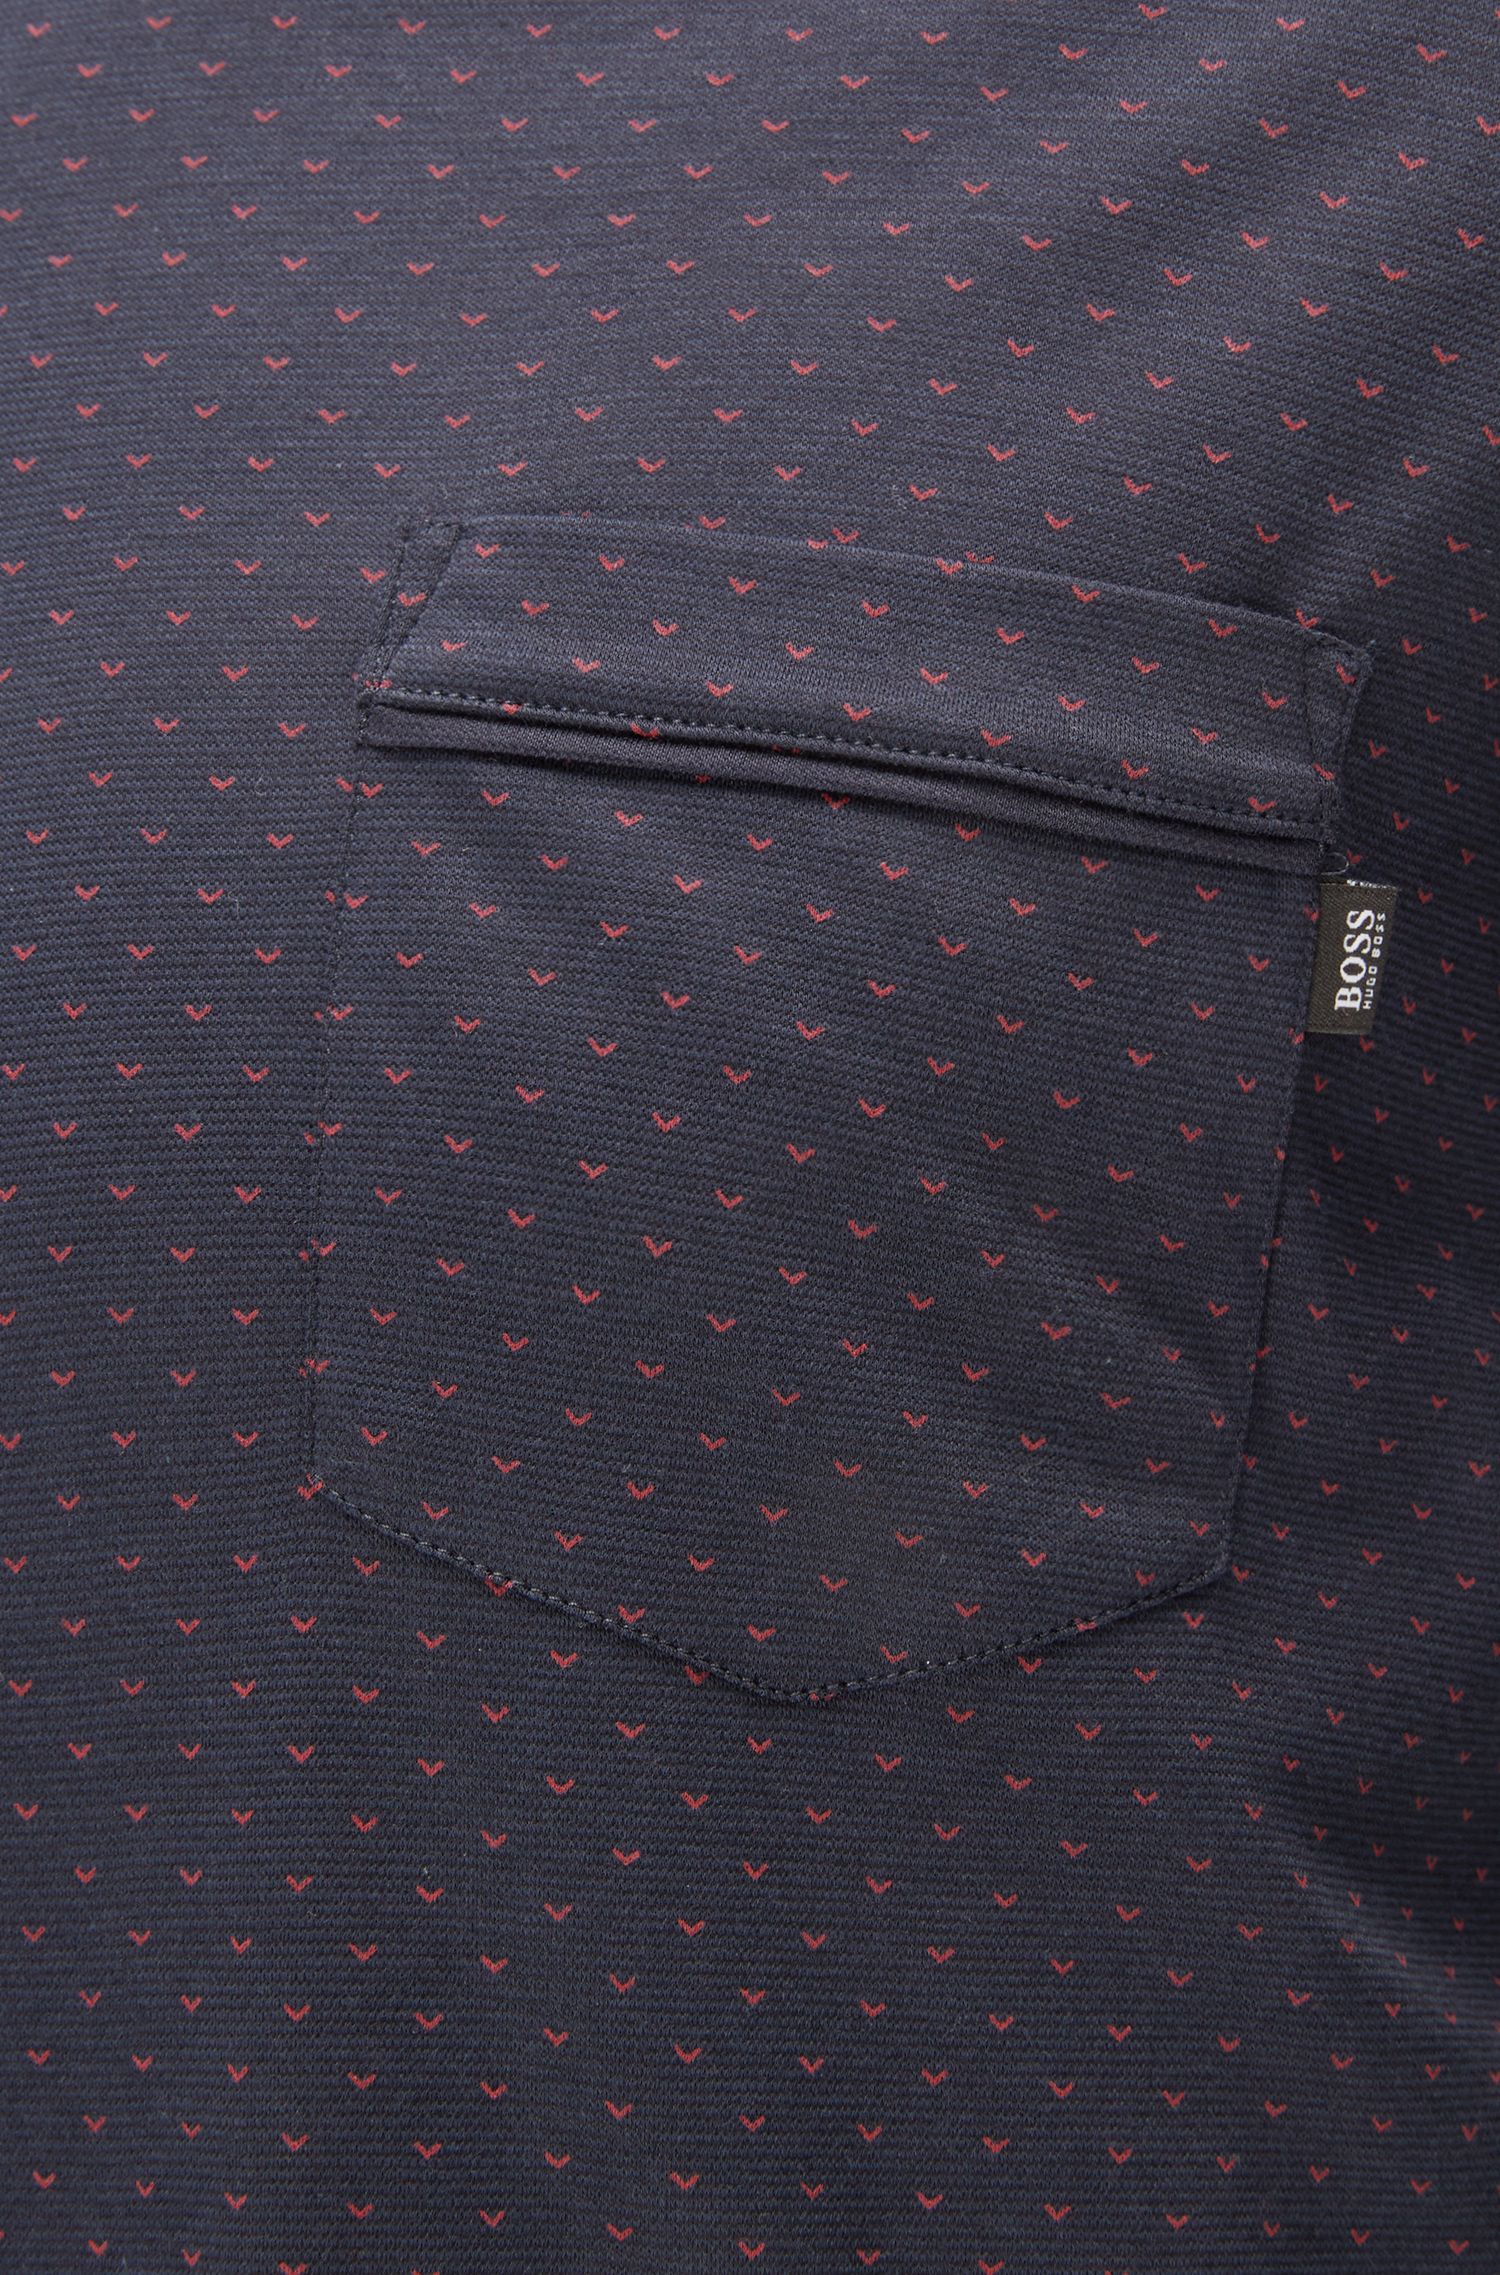 Geo-Print Stretch Jersey Long Sleeve T-Shirt | LS Shirt RN